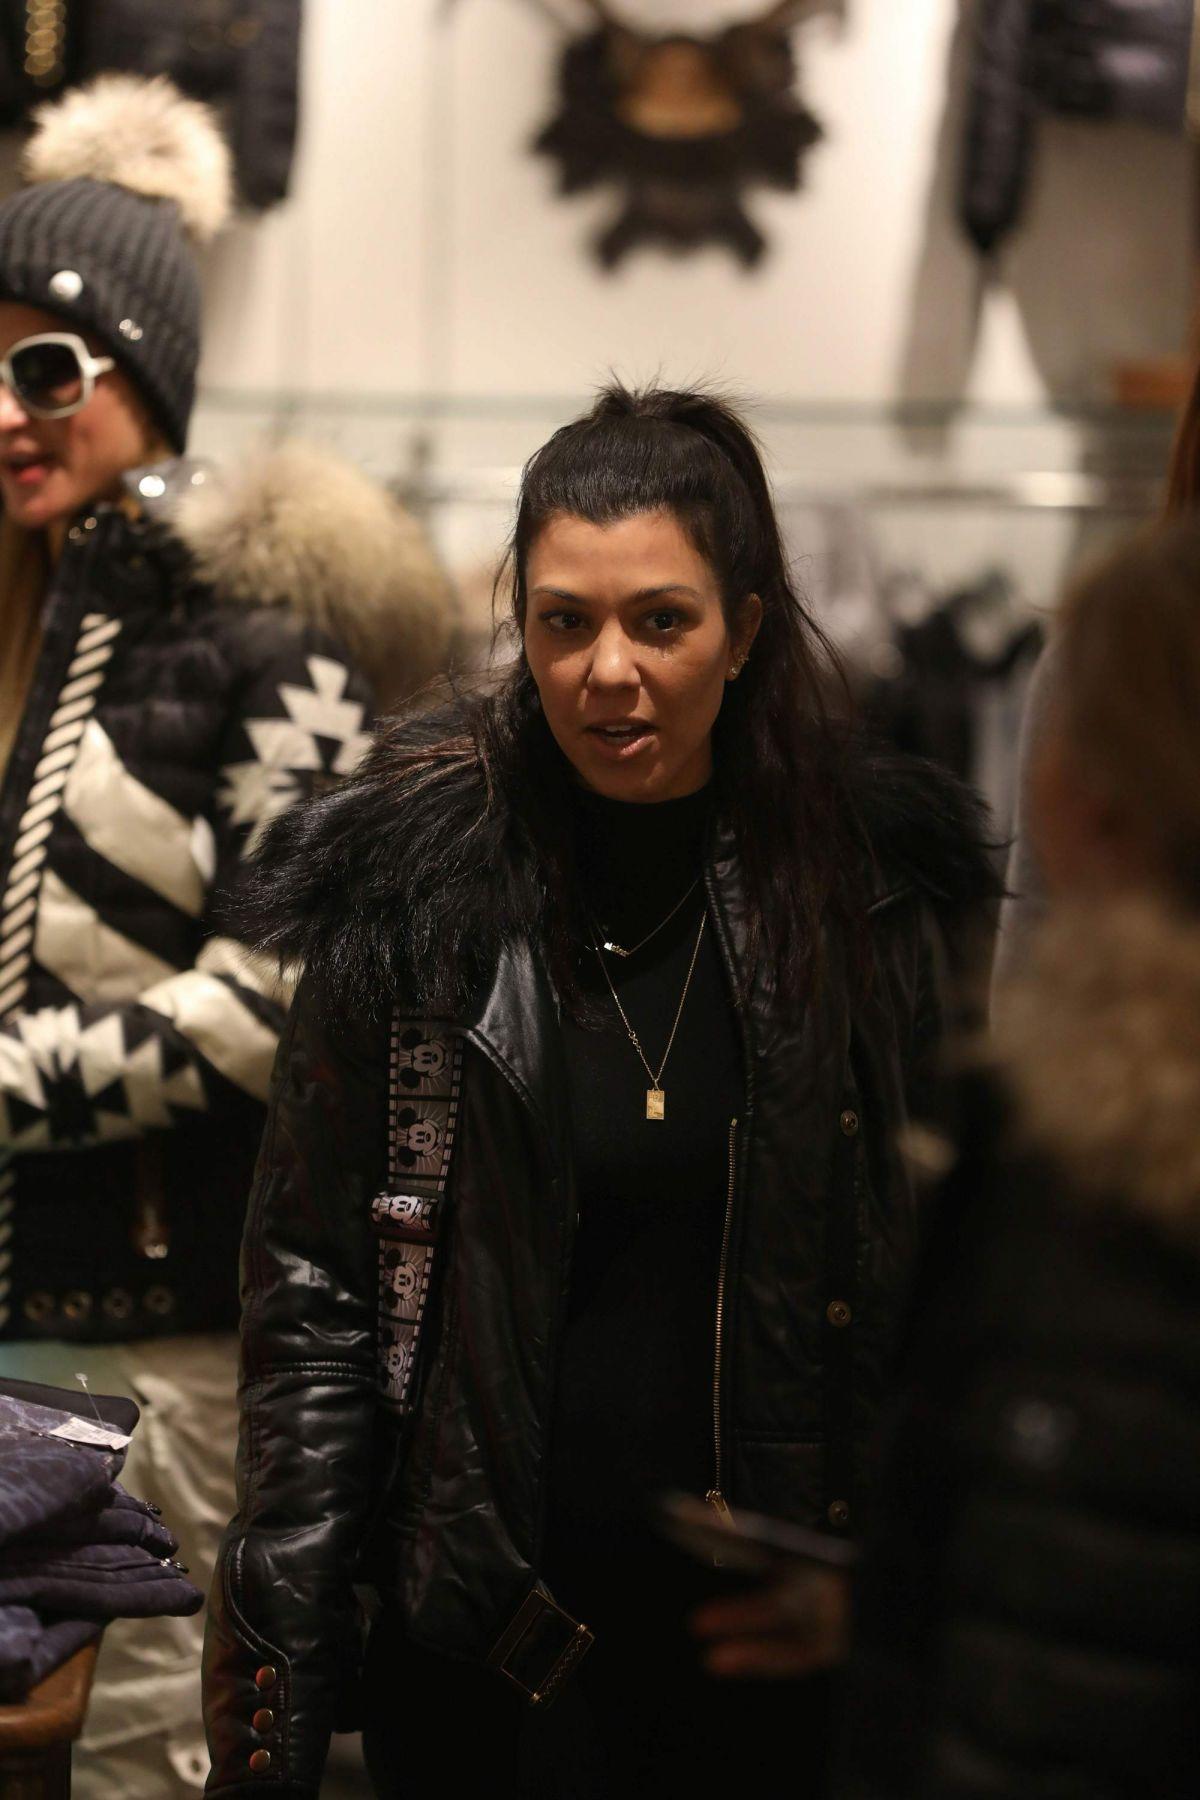 moncler jacket kim kardashian